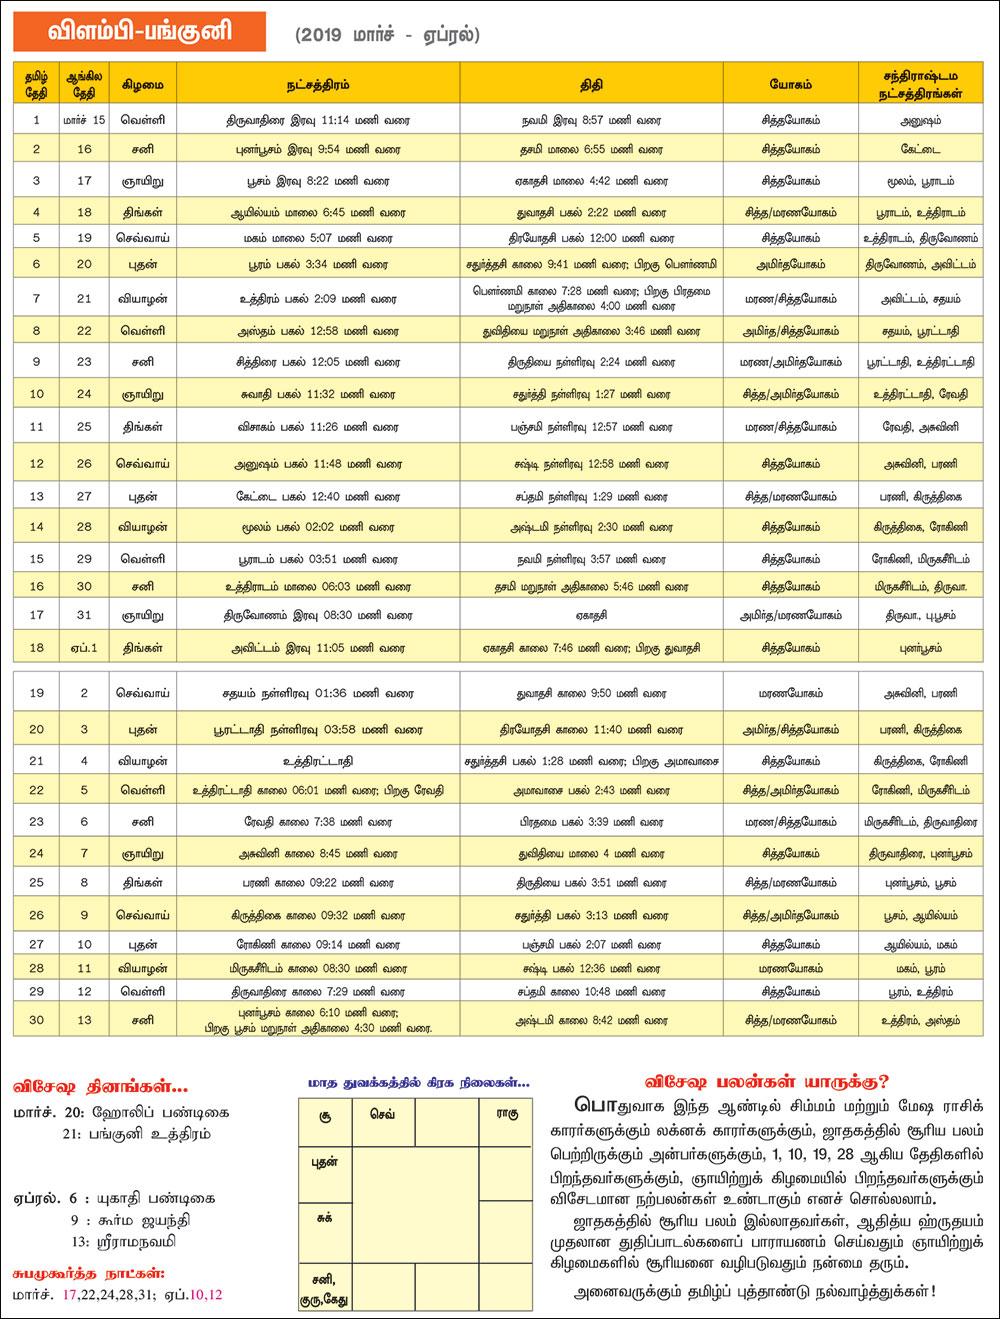 Sakthi Vikatan - 10 April 2018 - 'விளம்பி' வருட